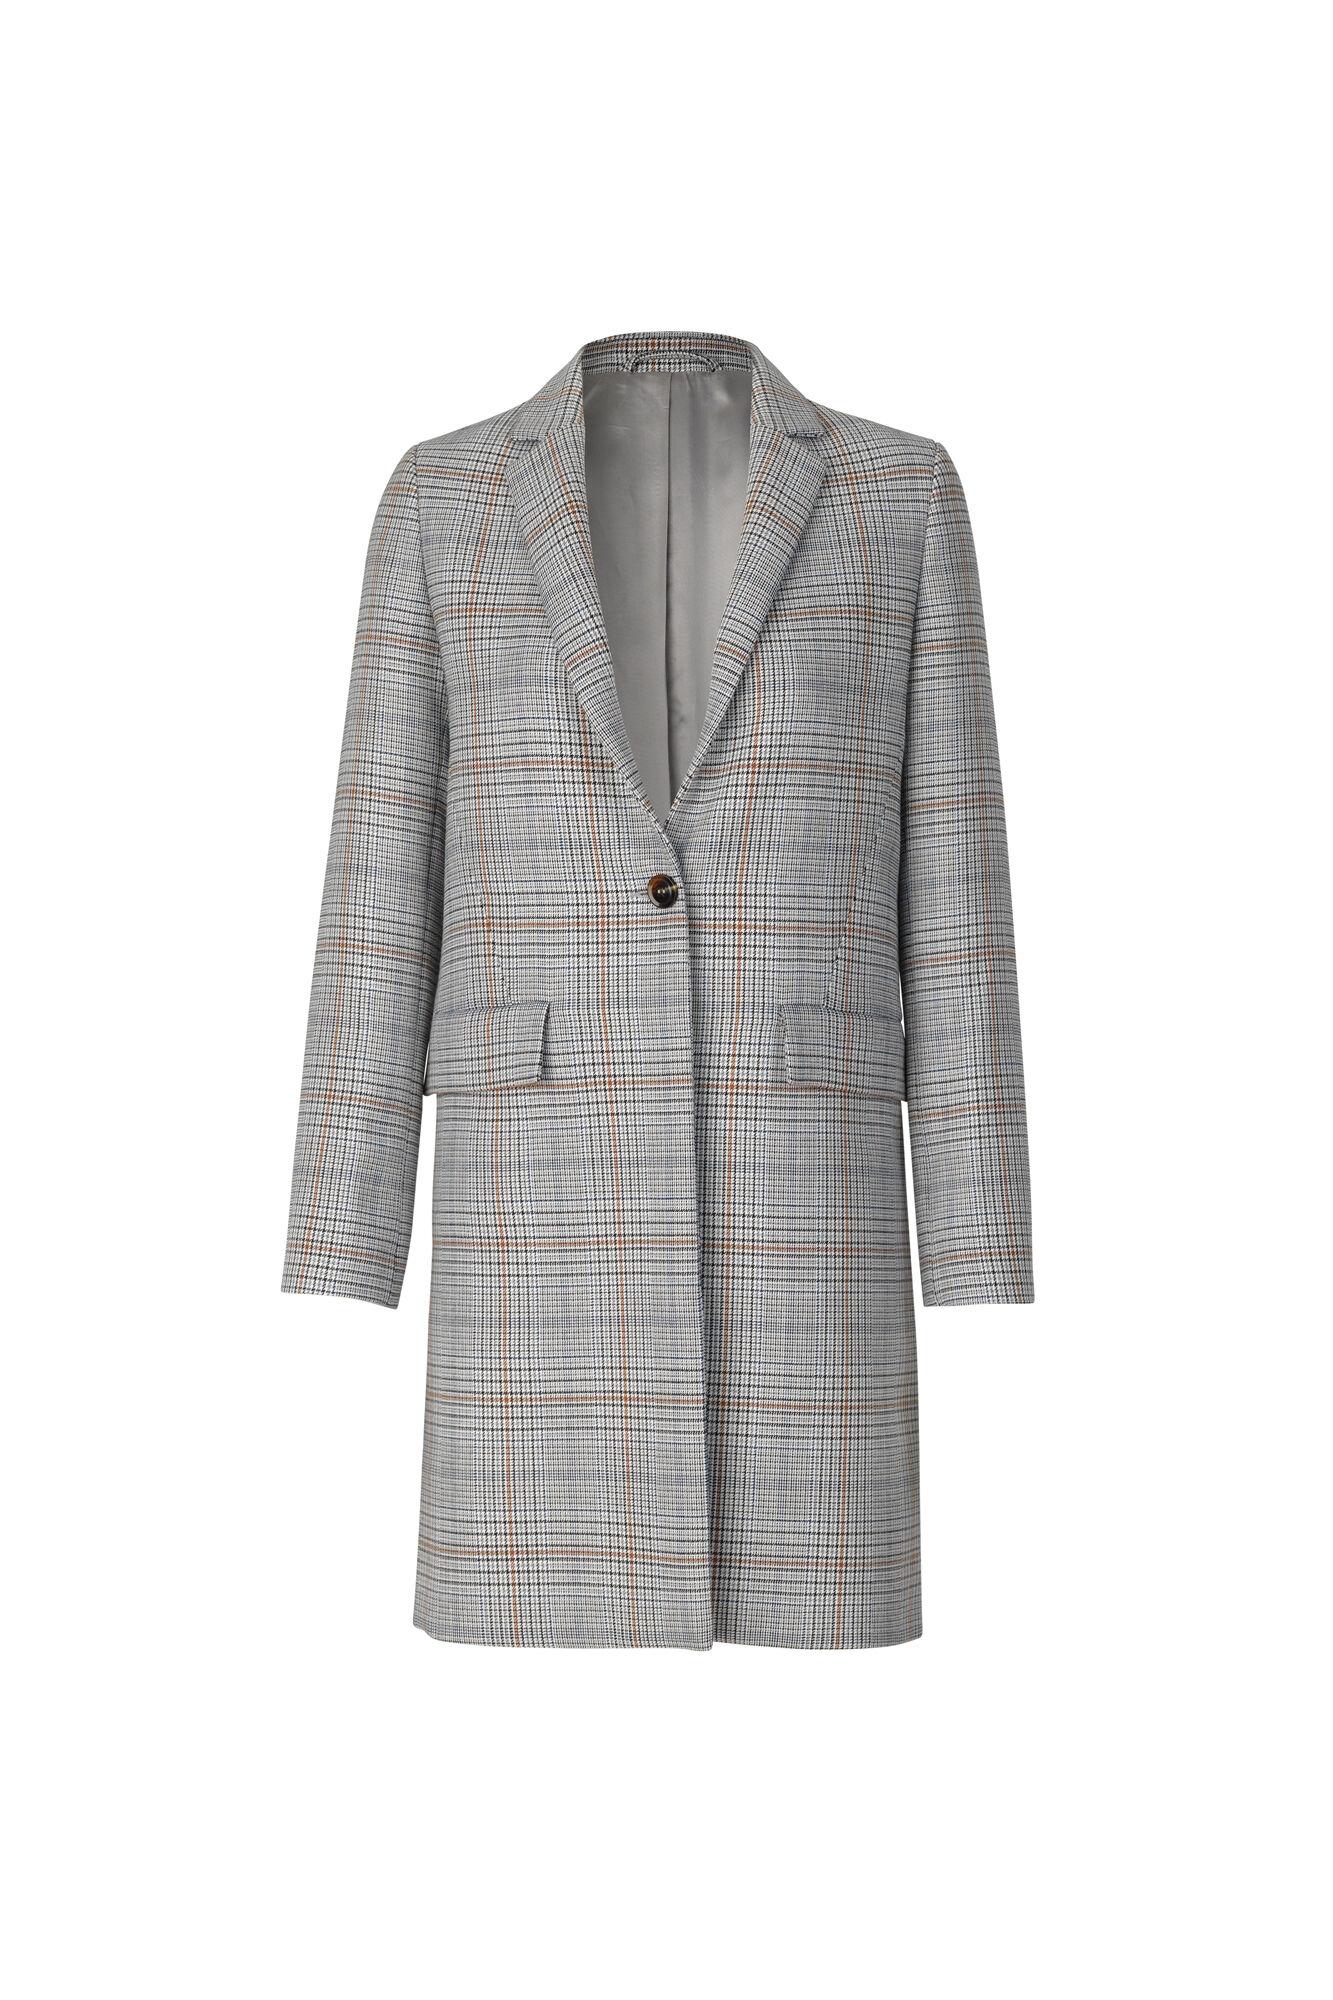 Taryn short jacket 10386, CHECK